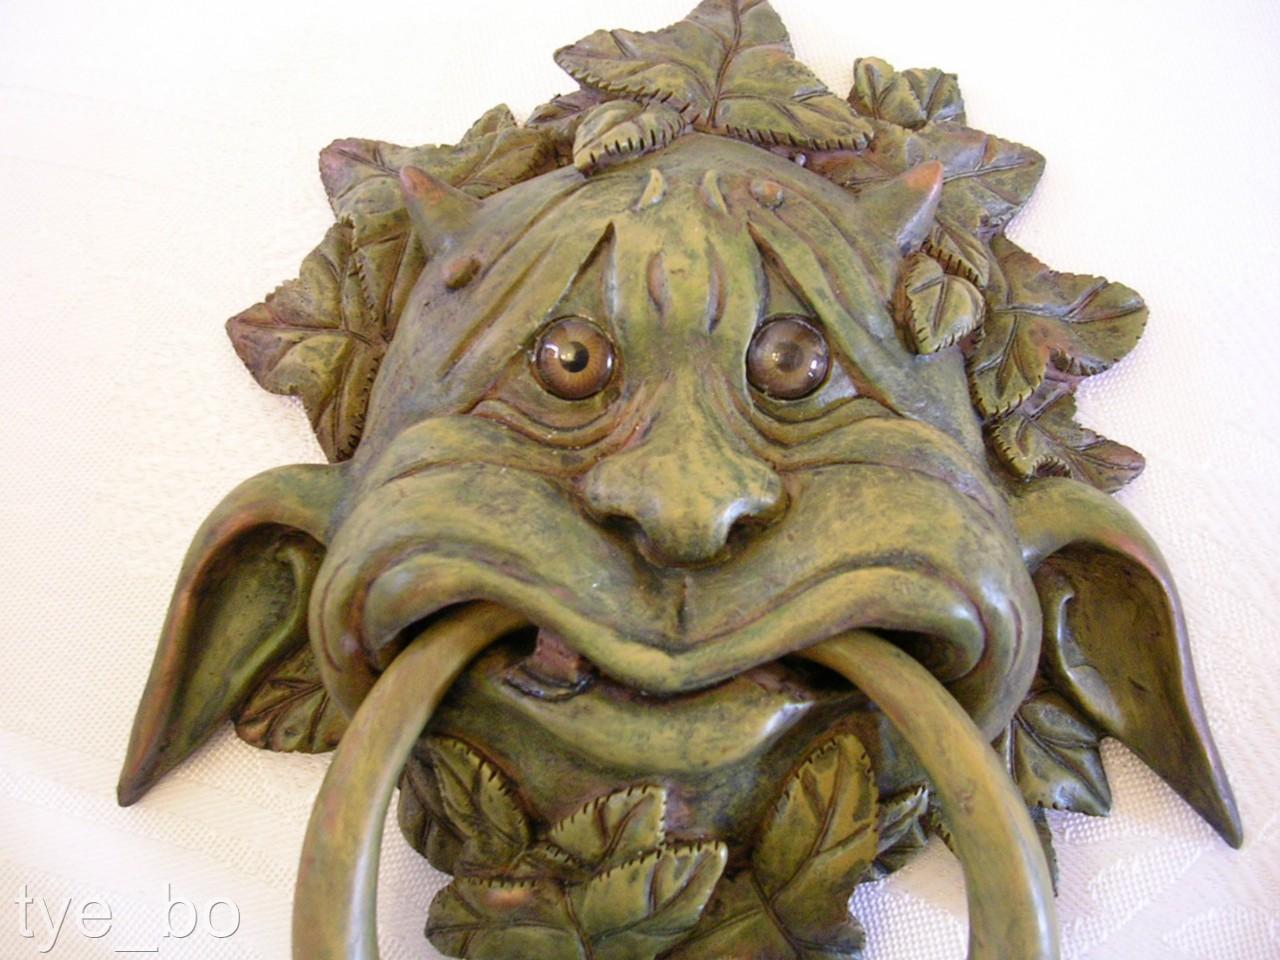 Gothic door knocker green man gargoyle tree spirit decorative use only ebay - Green man door knocker ...